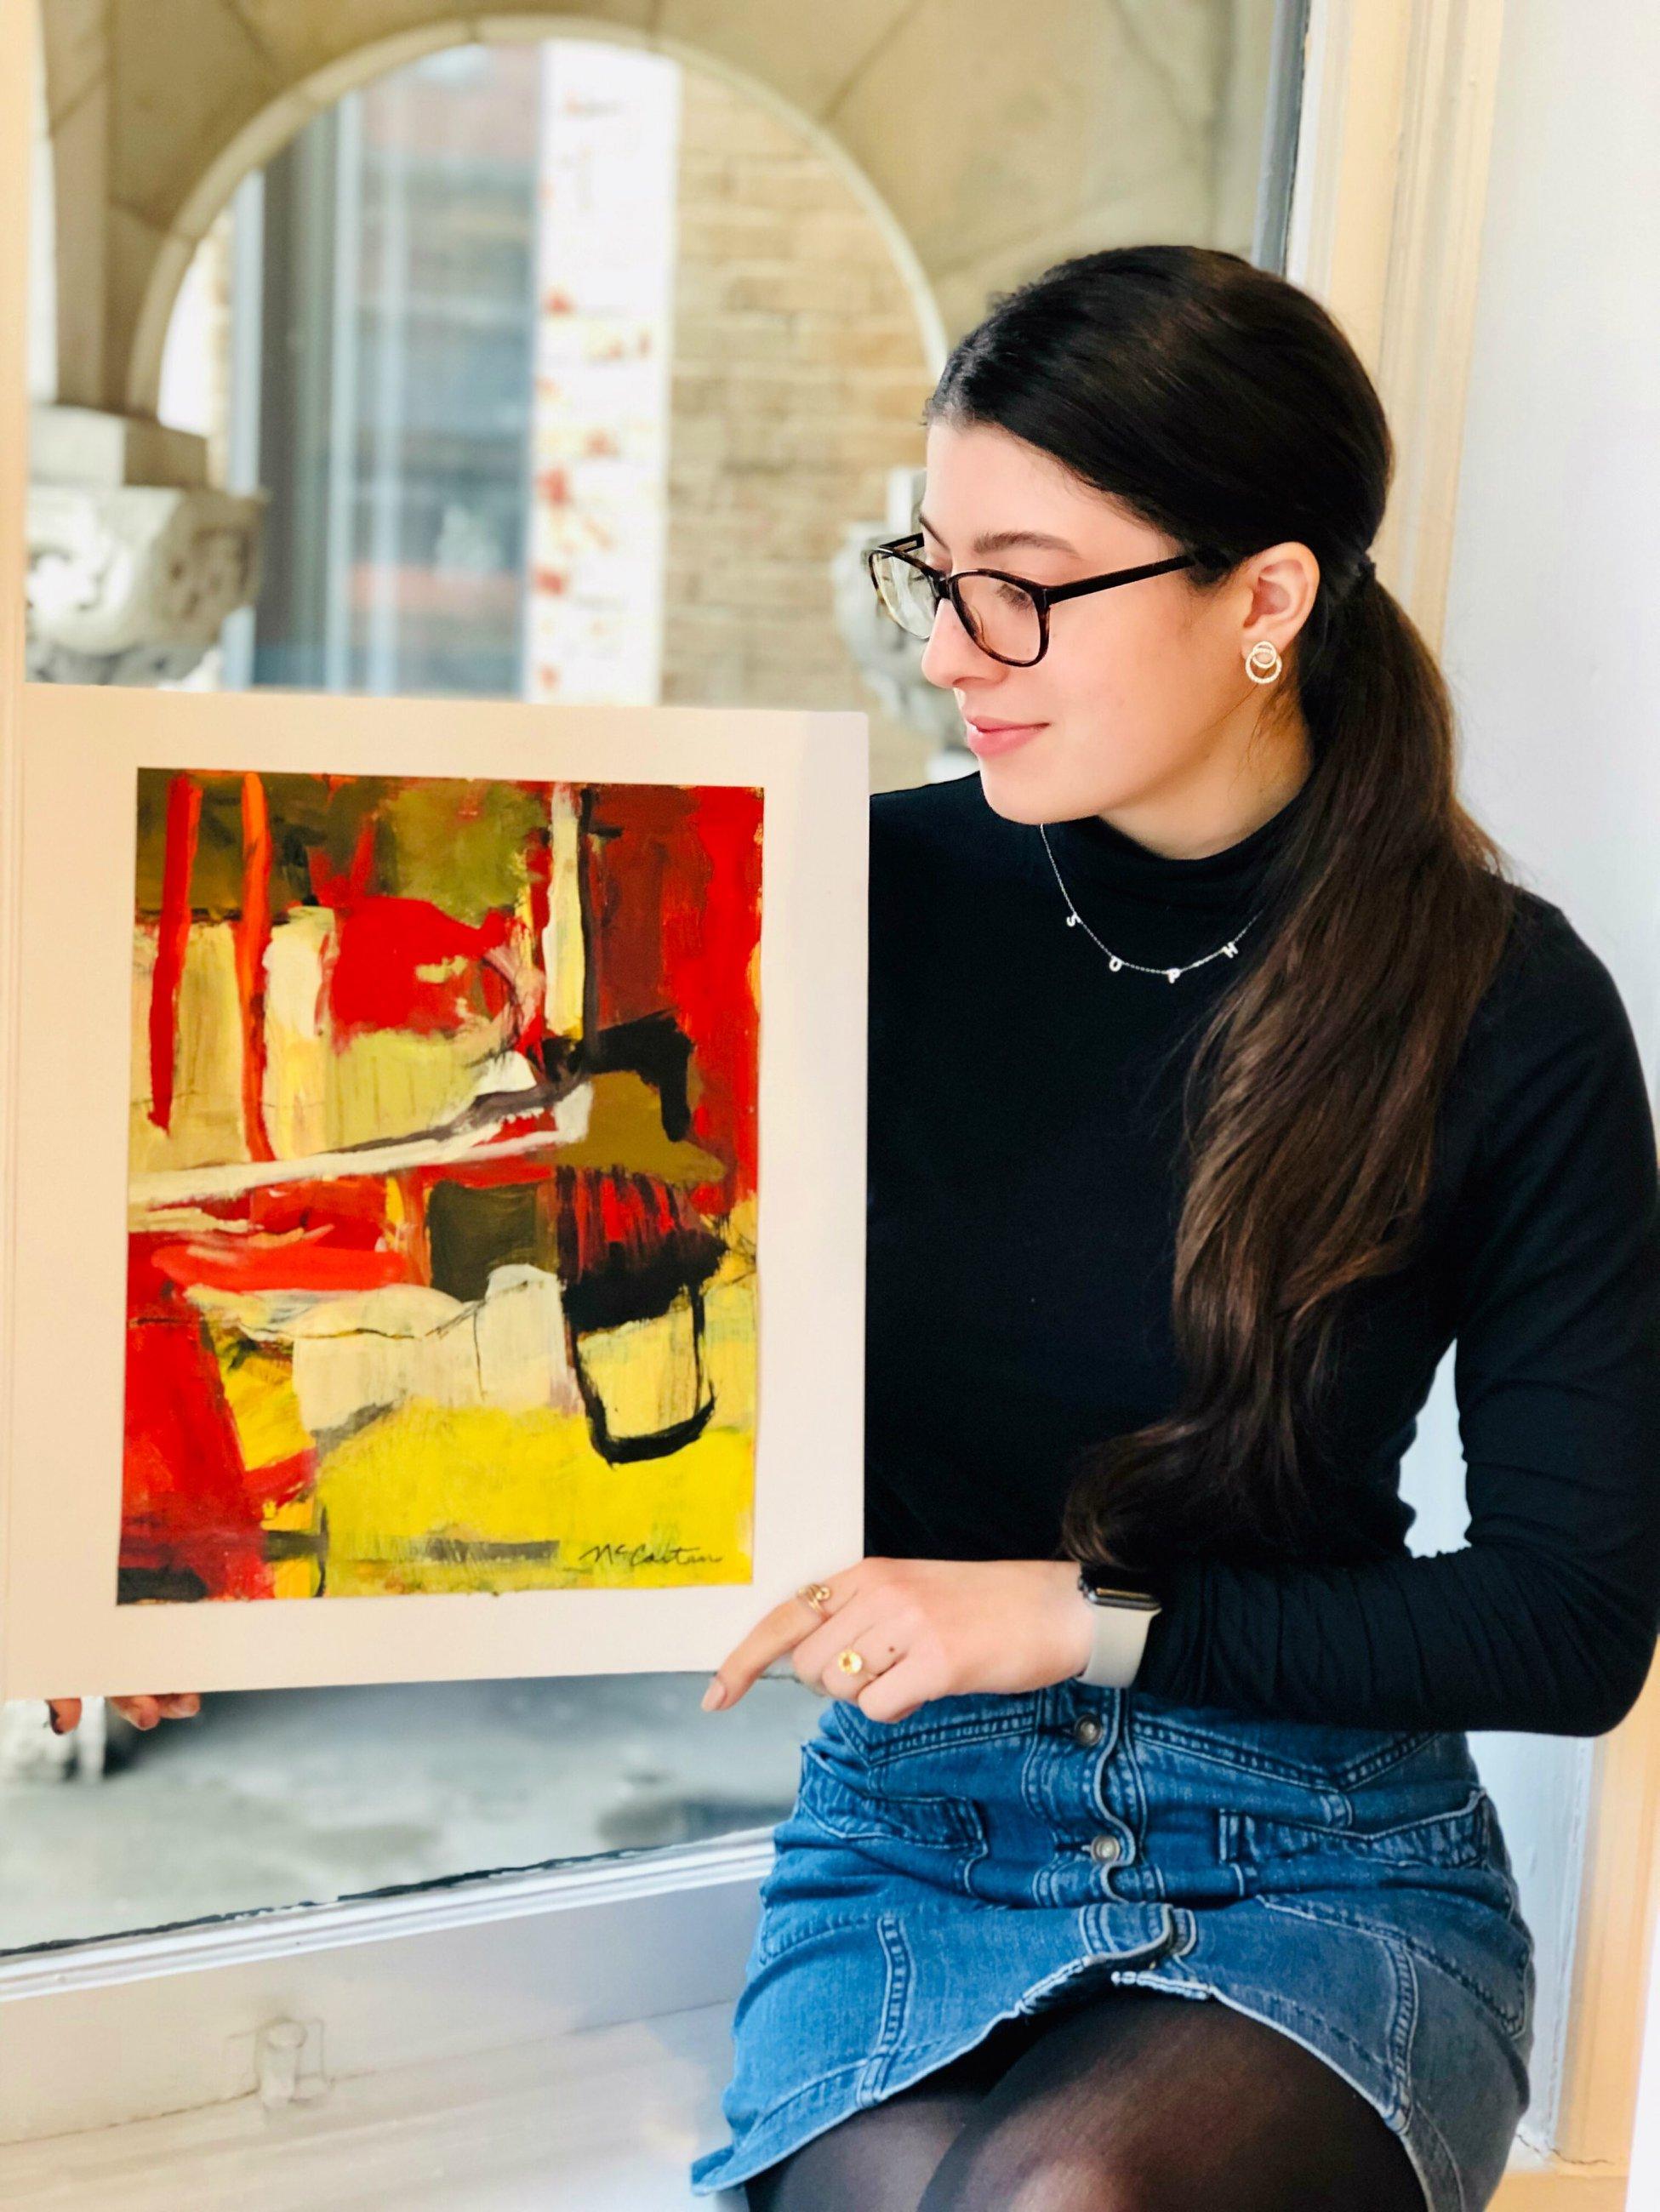 Staff pick of the week with intern Sophia Maitino